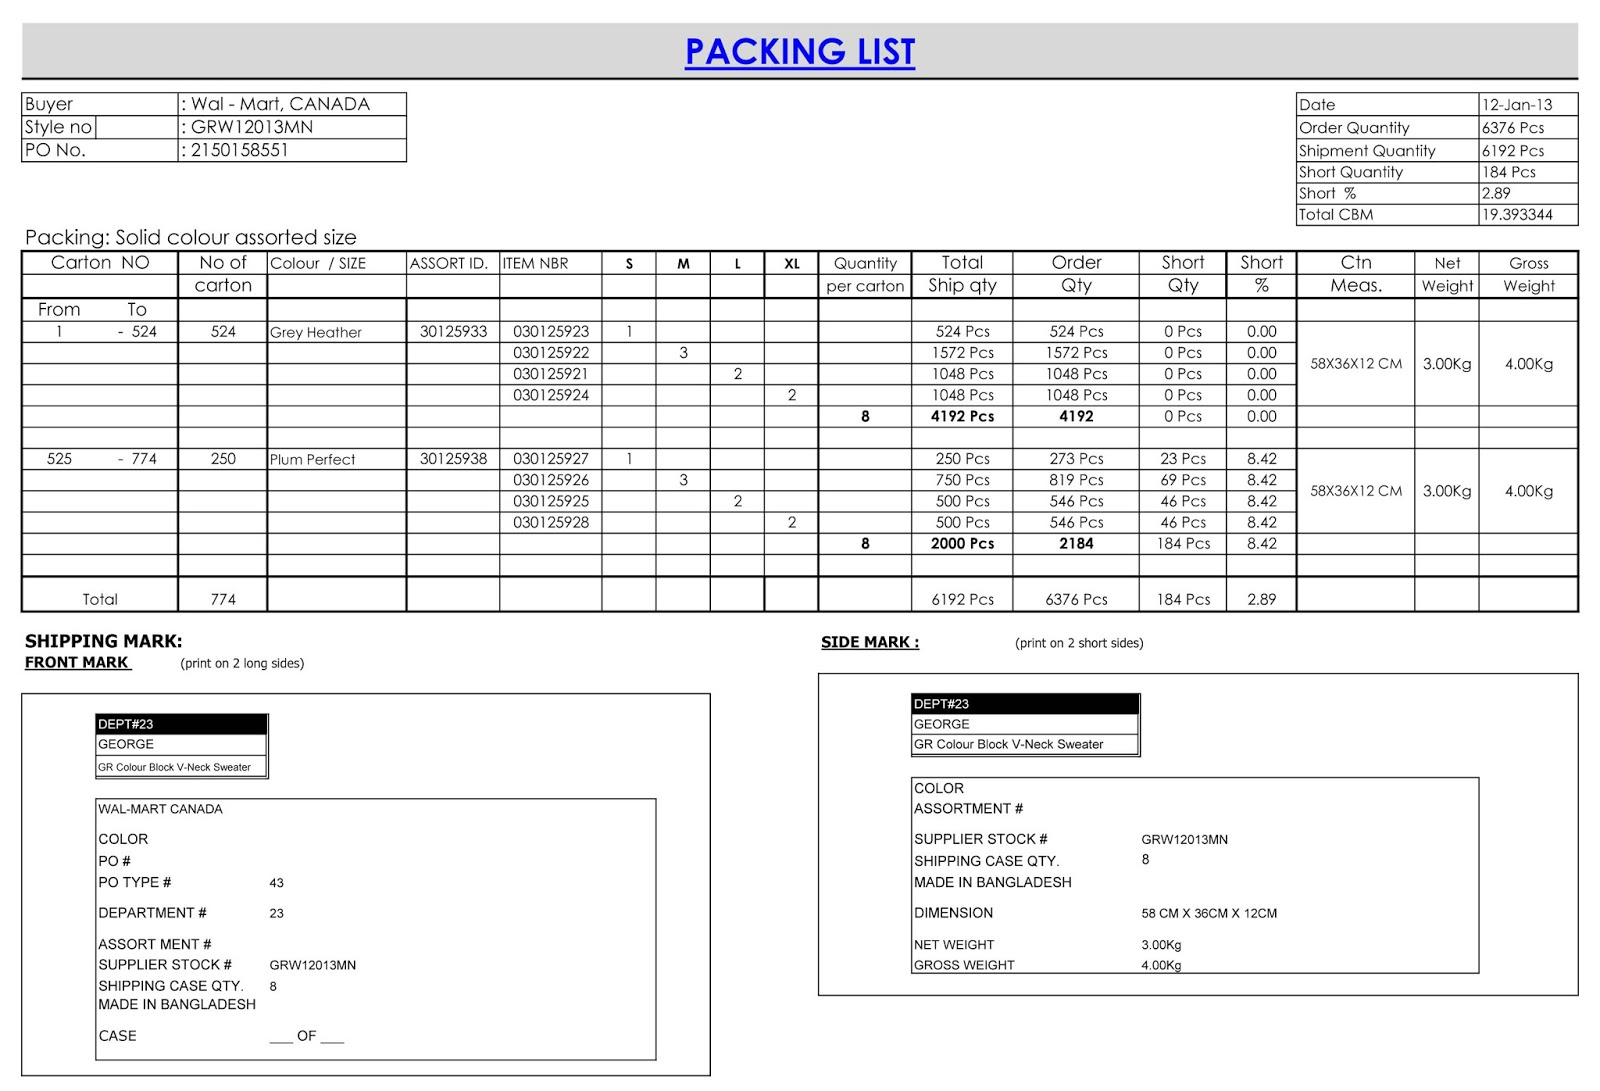 Apparel Merchandising World: Packing List